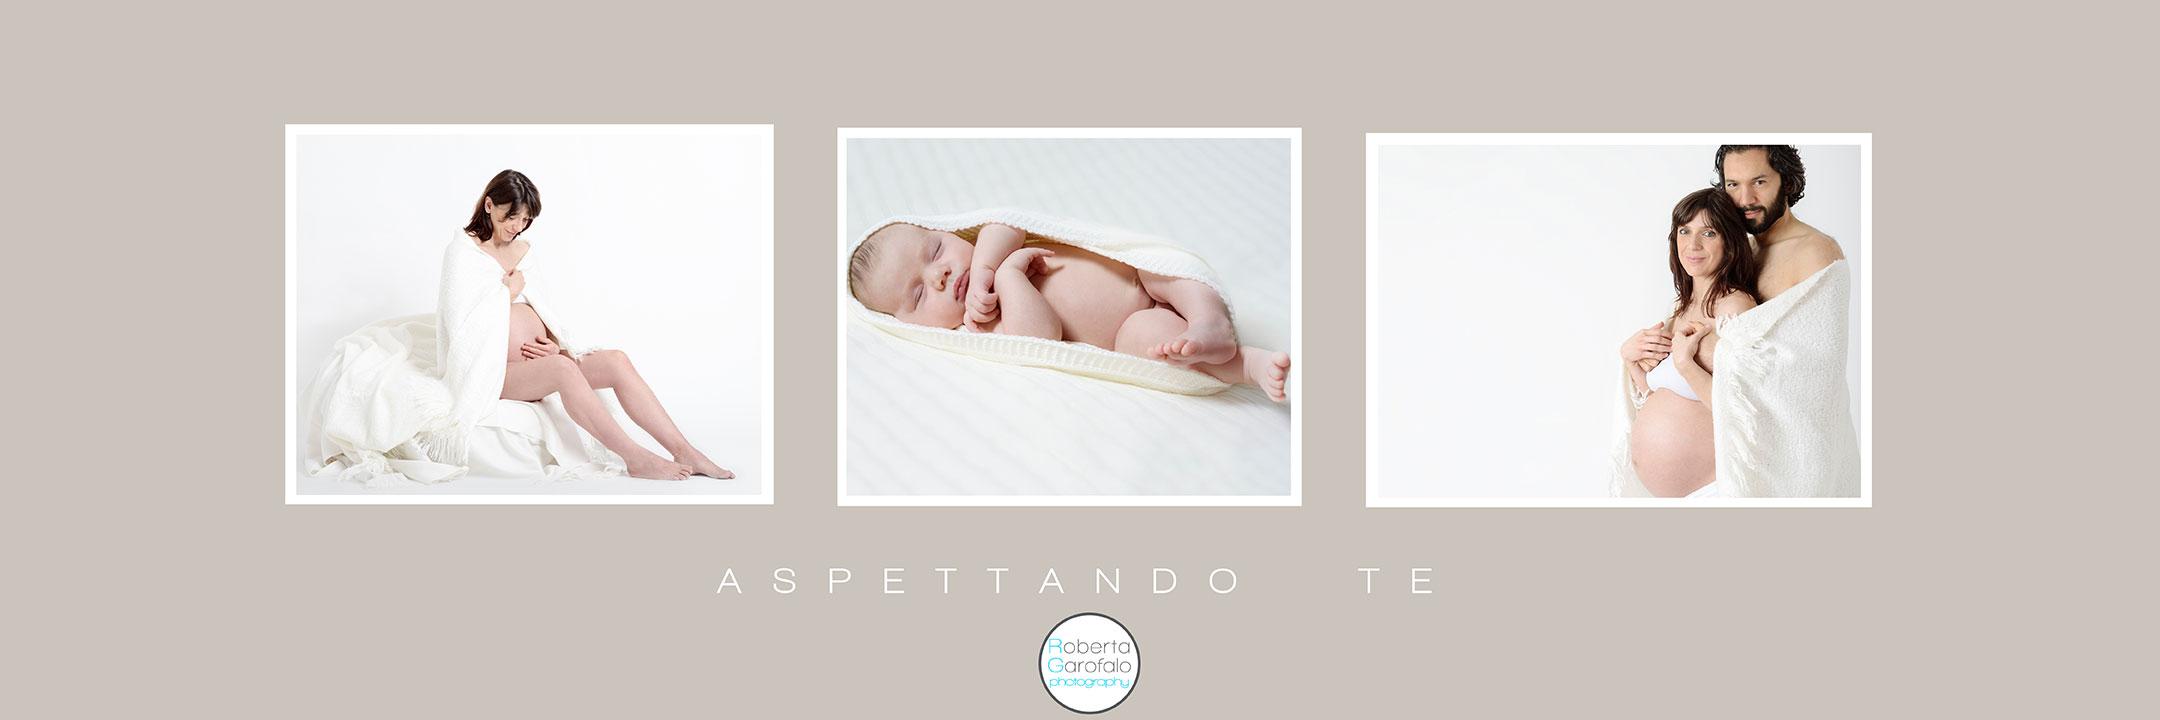 Ritratti fotografici di gravidanza a Roma Roberta Garofalo photography